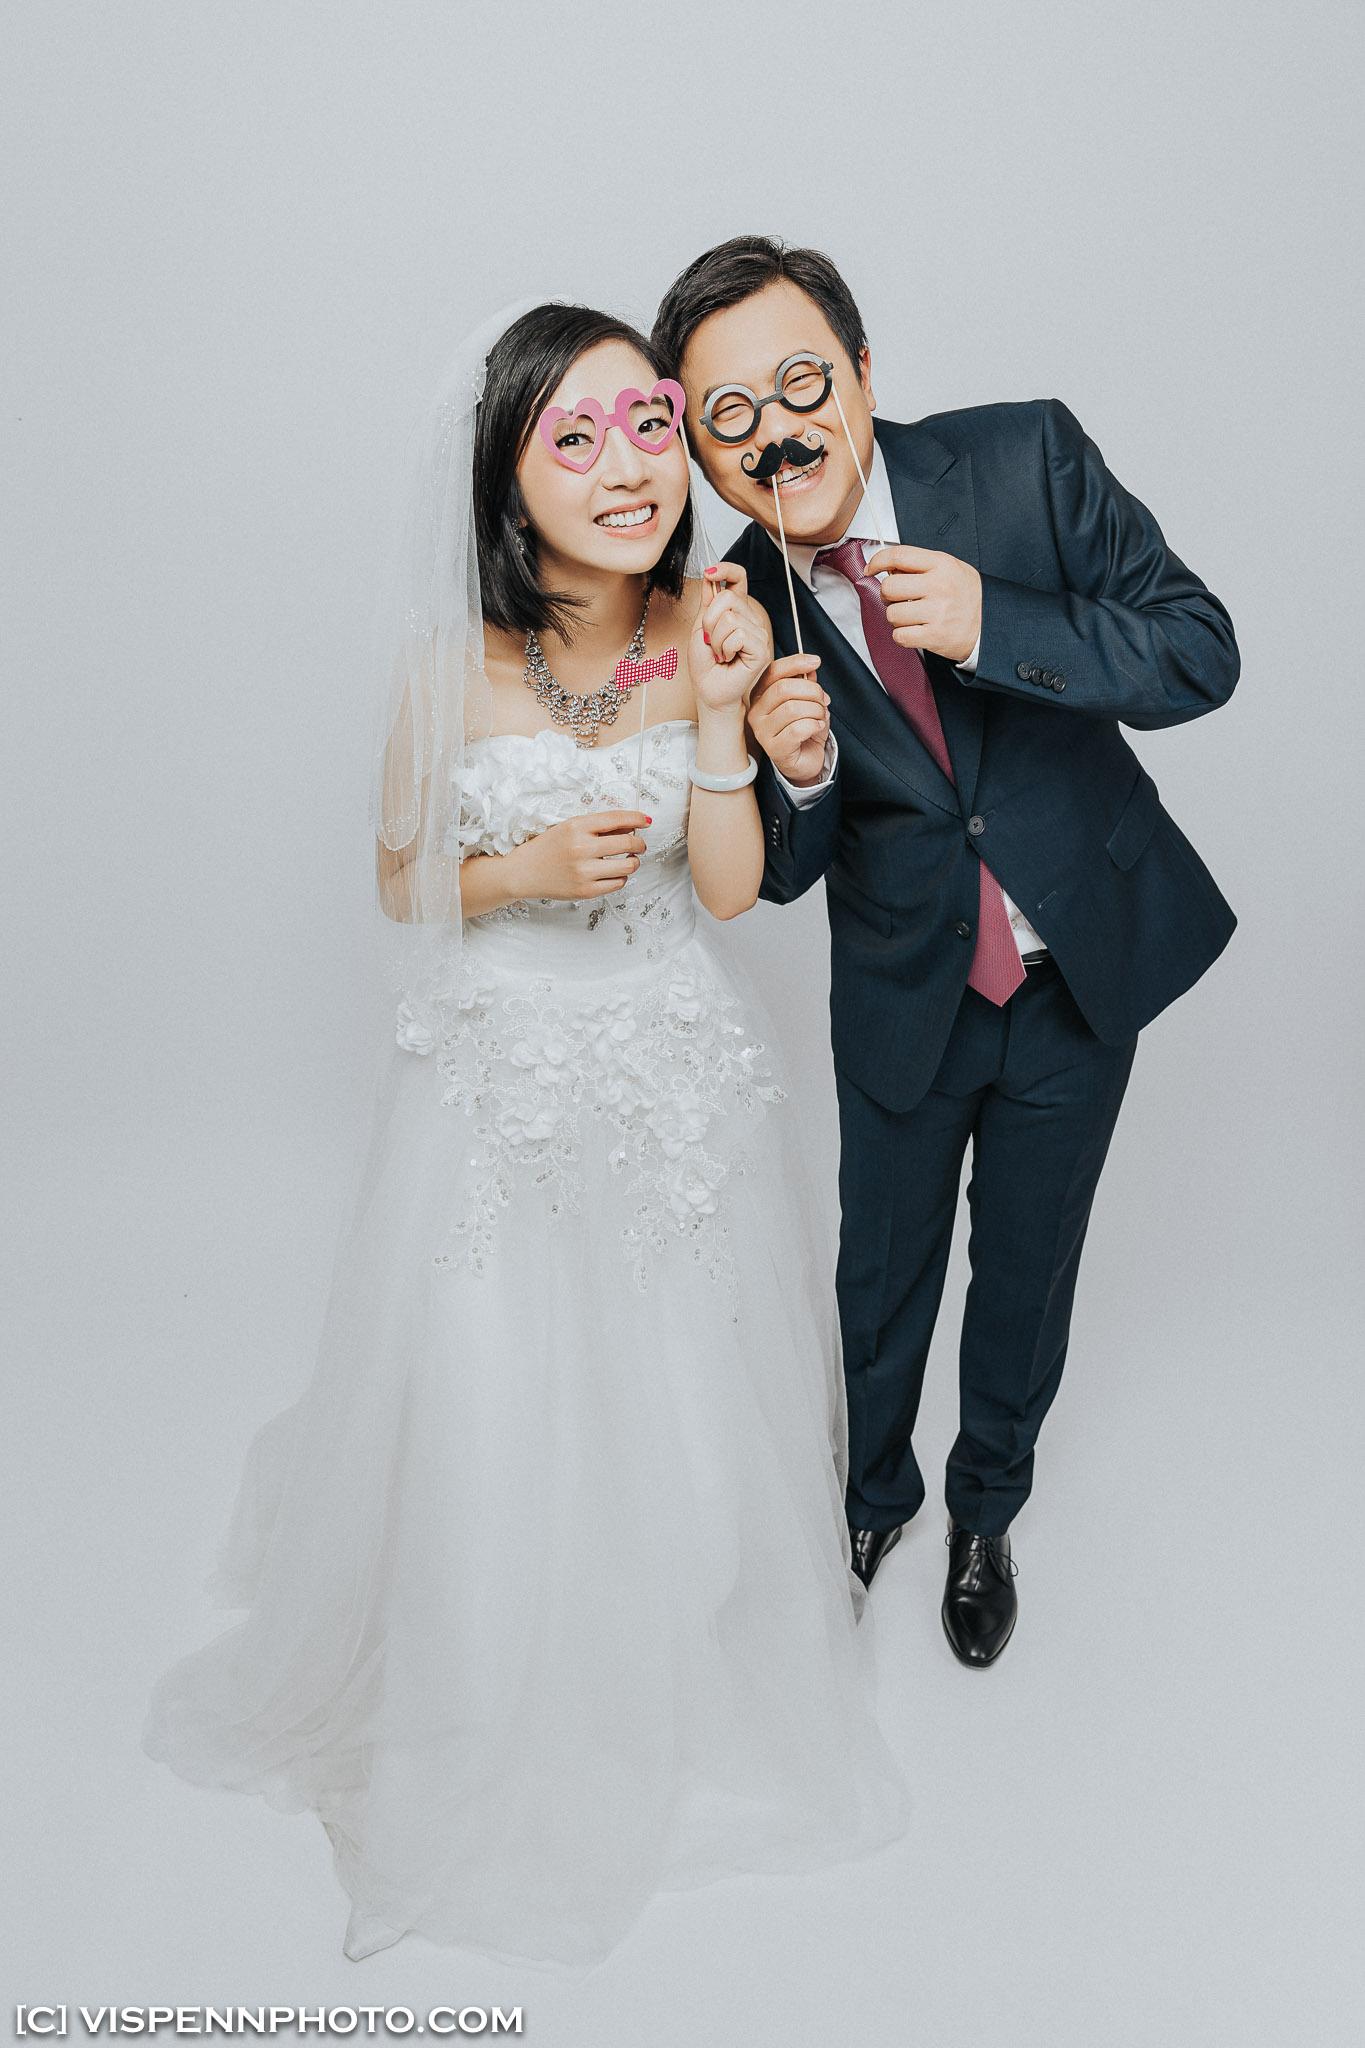 PRE WEDDING Photography Melbourne VISPENN 墨尔本 婚纱照 结婚照 婚纱摄影 FangYuan Wedding 1593